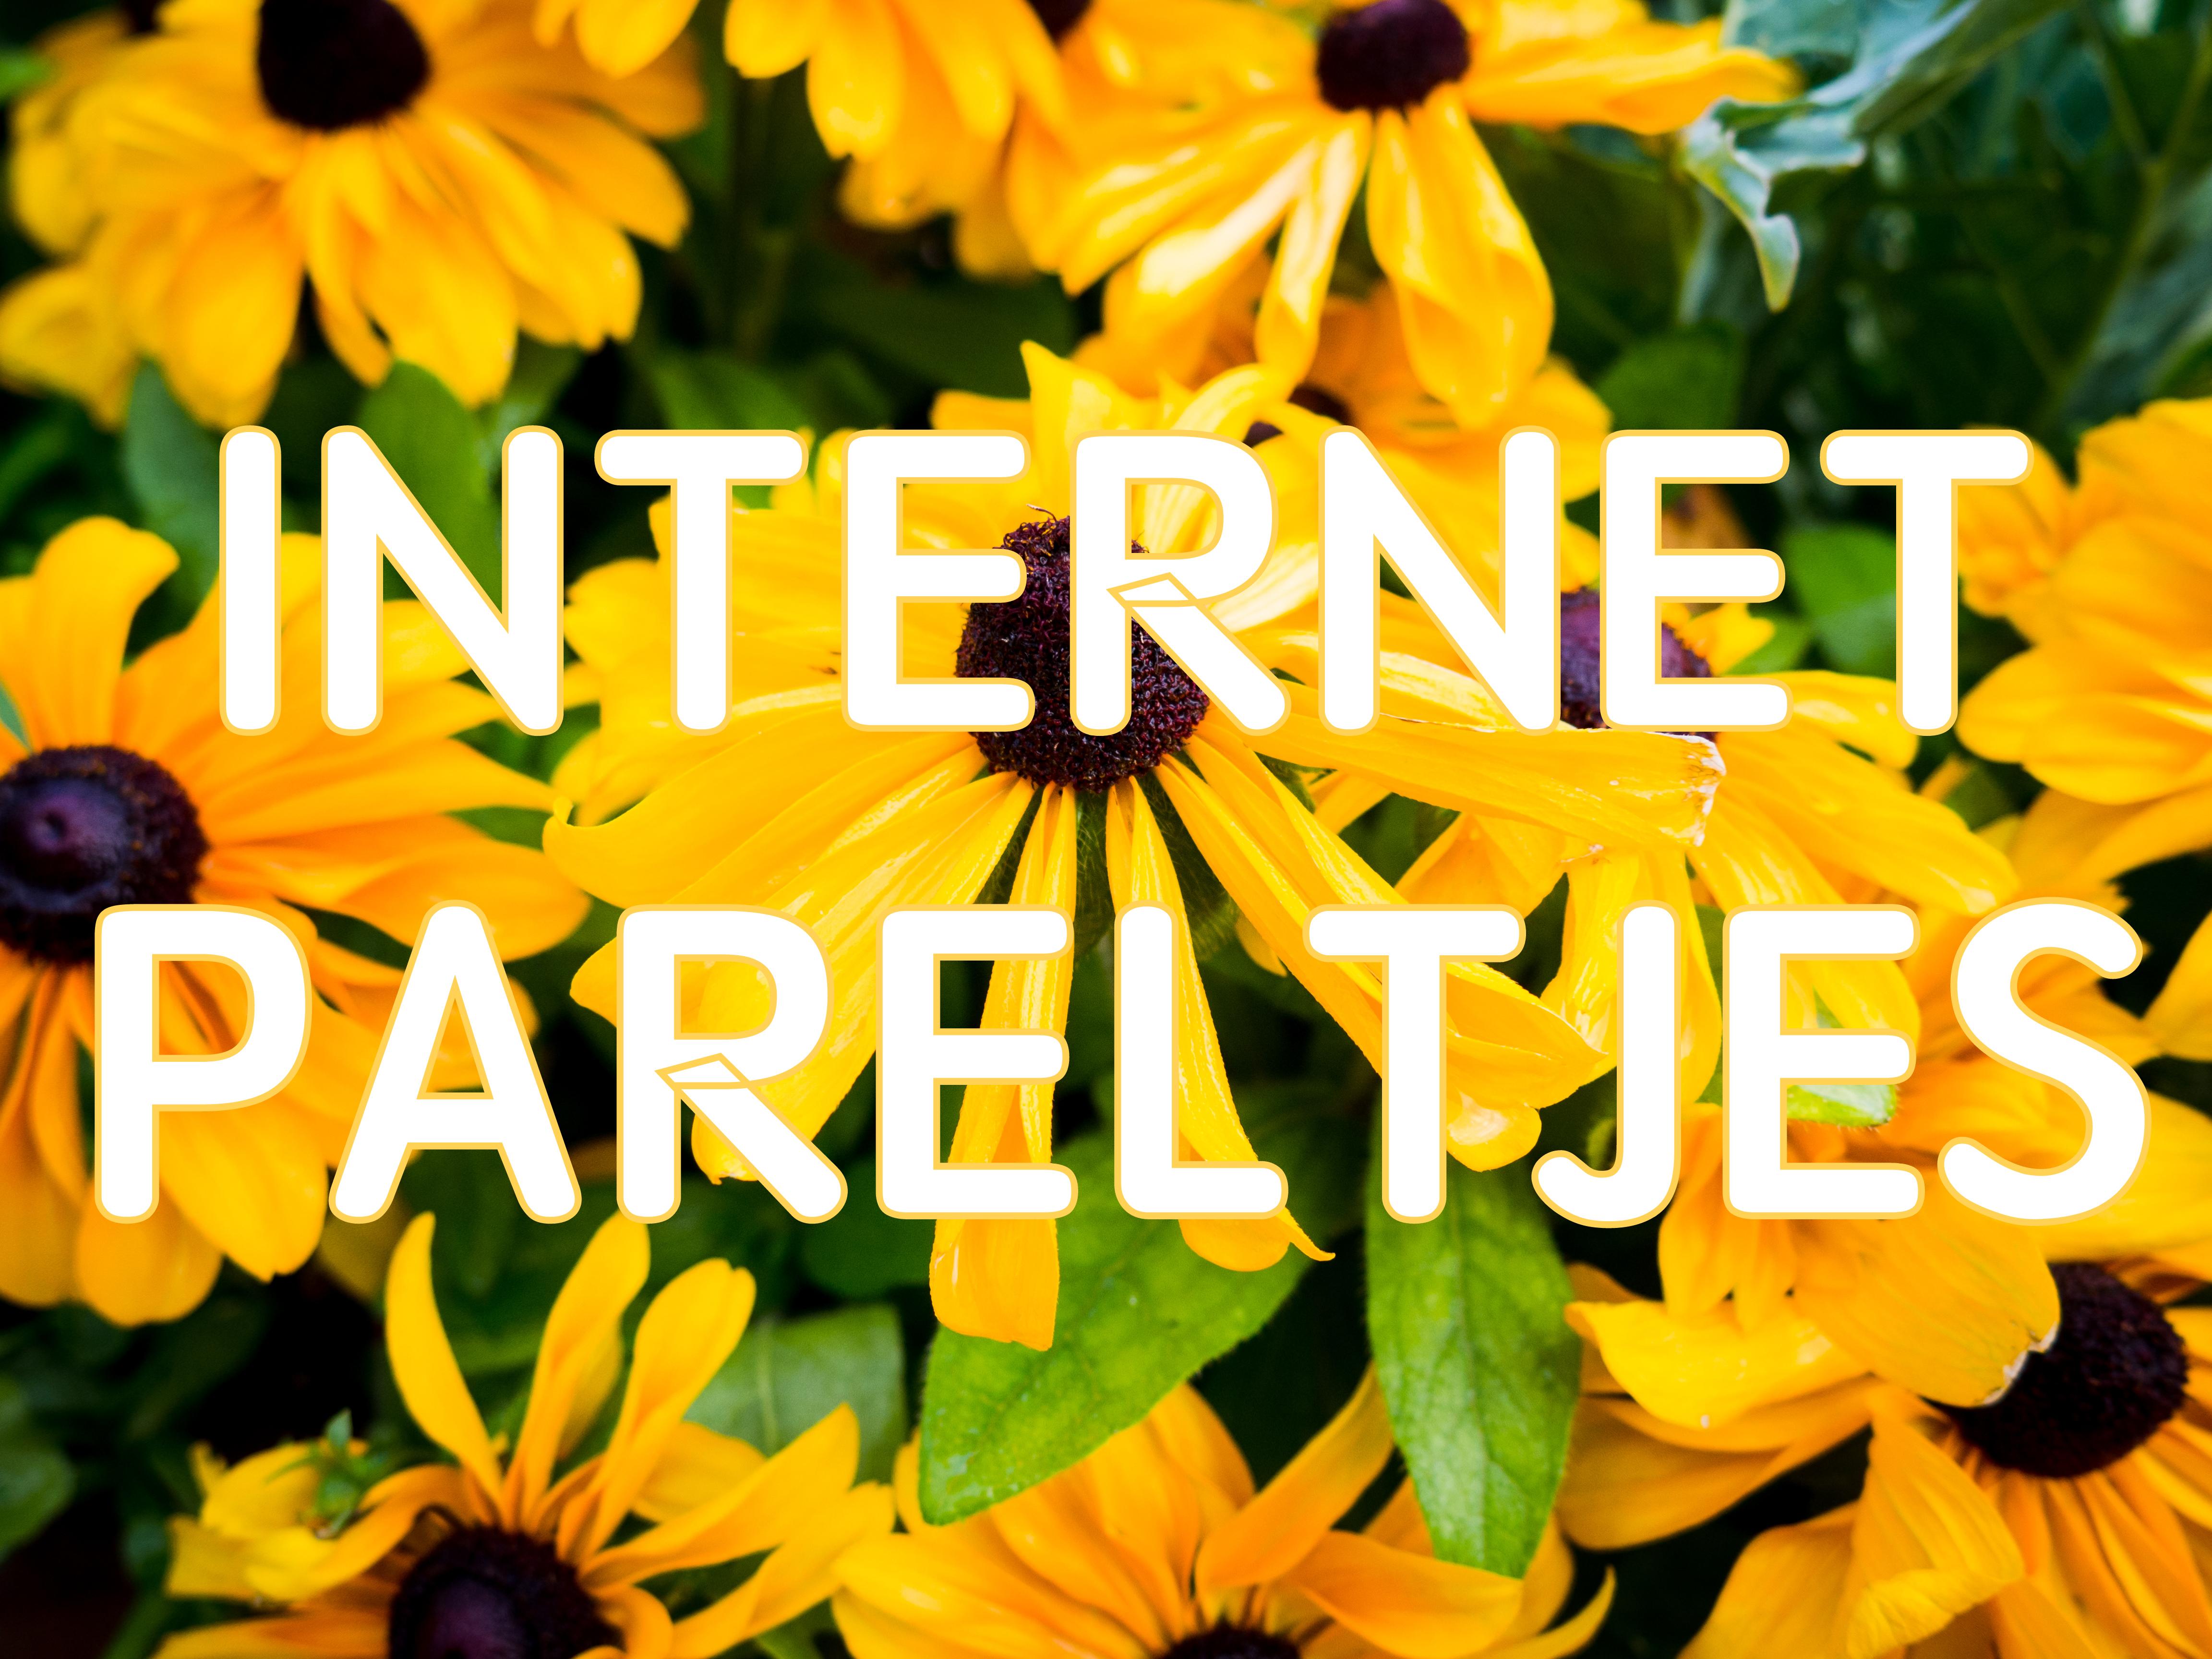 Internet pareltjes